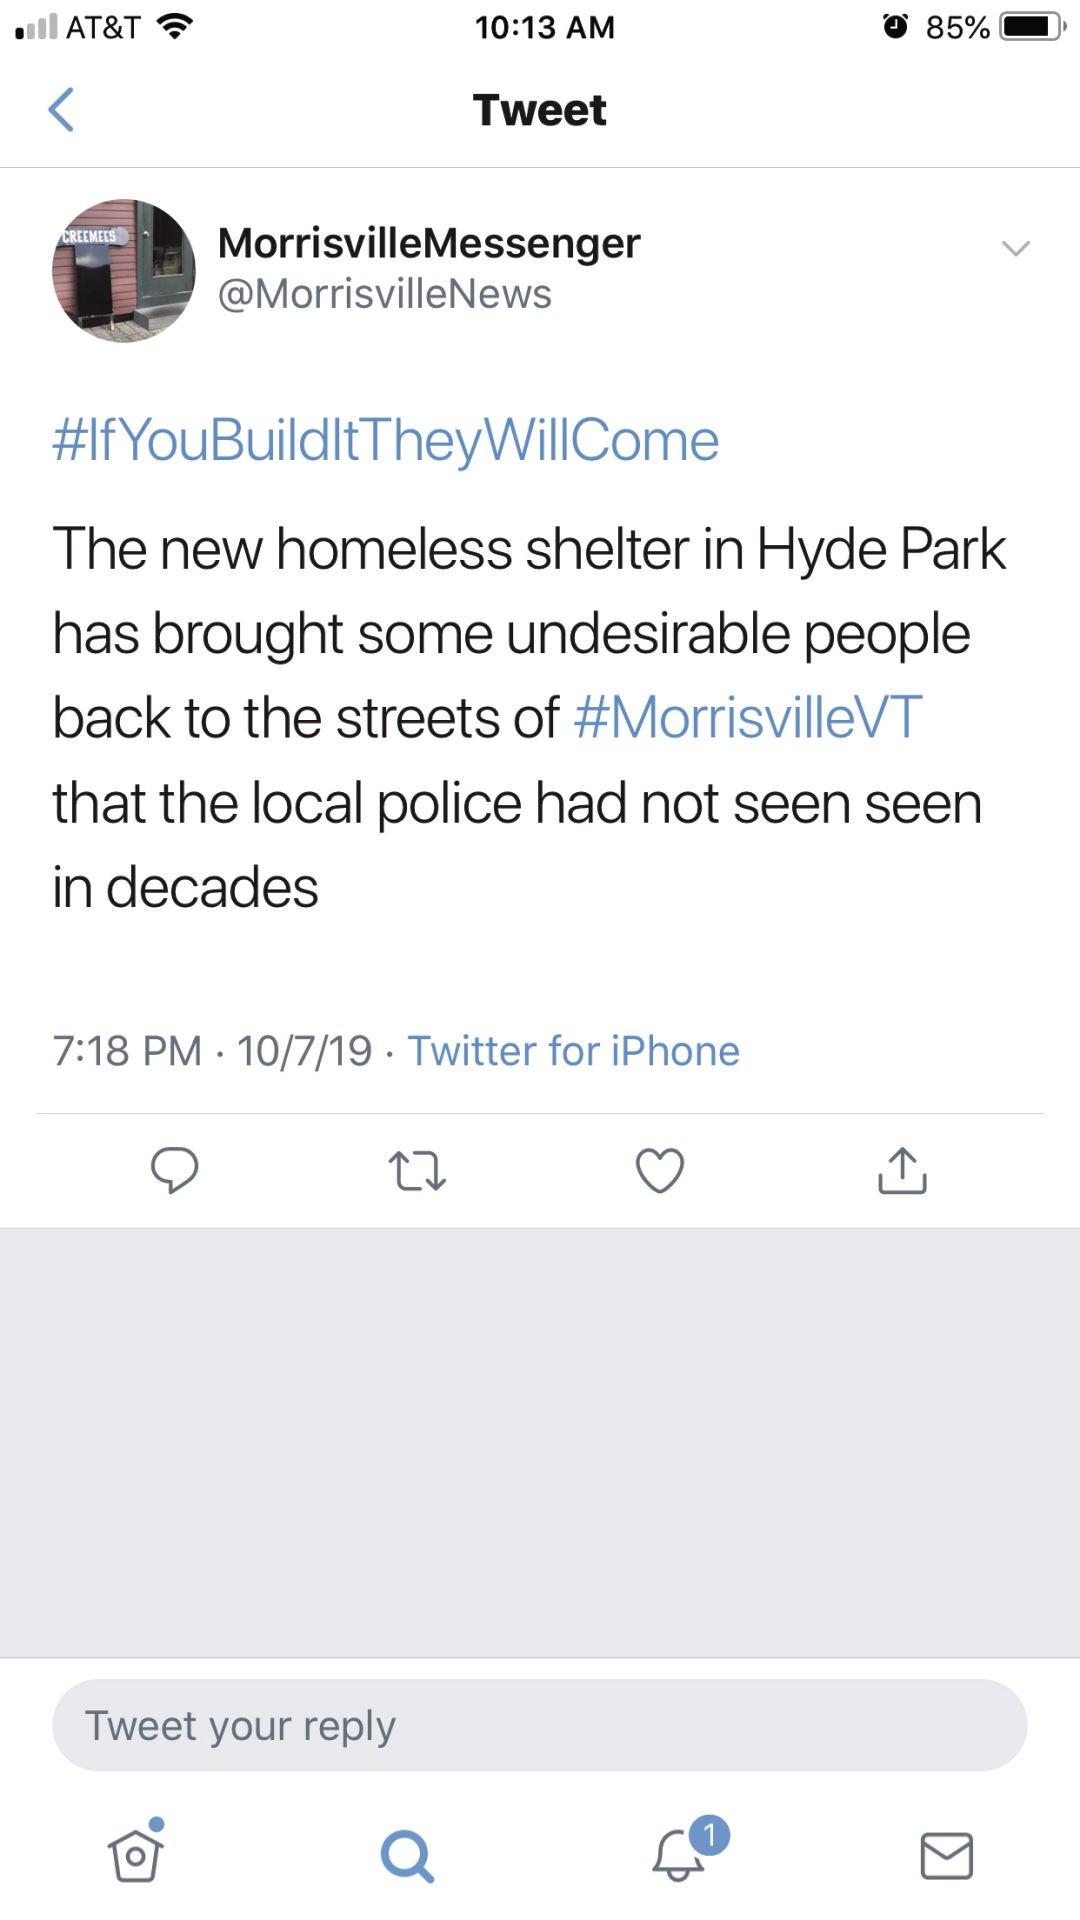 Morrisville Messenger tweet